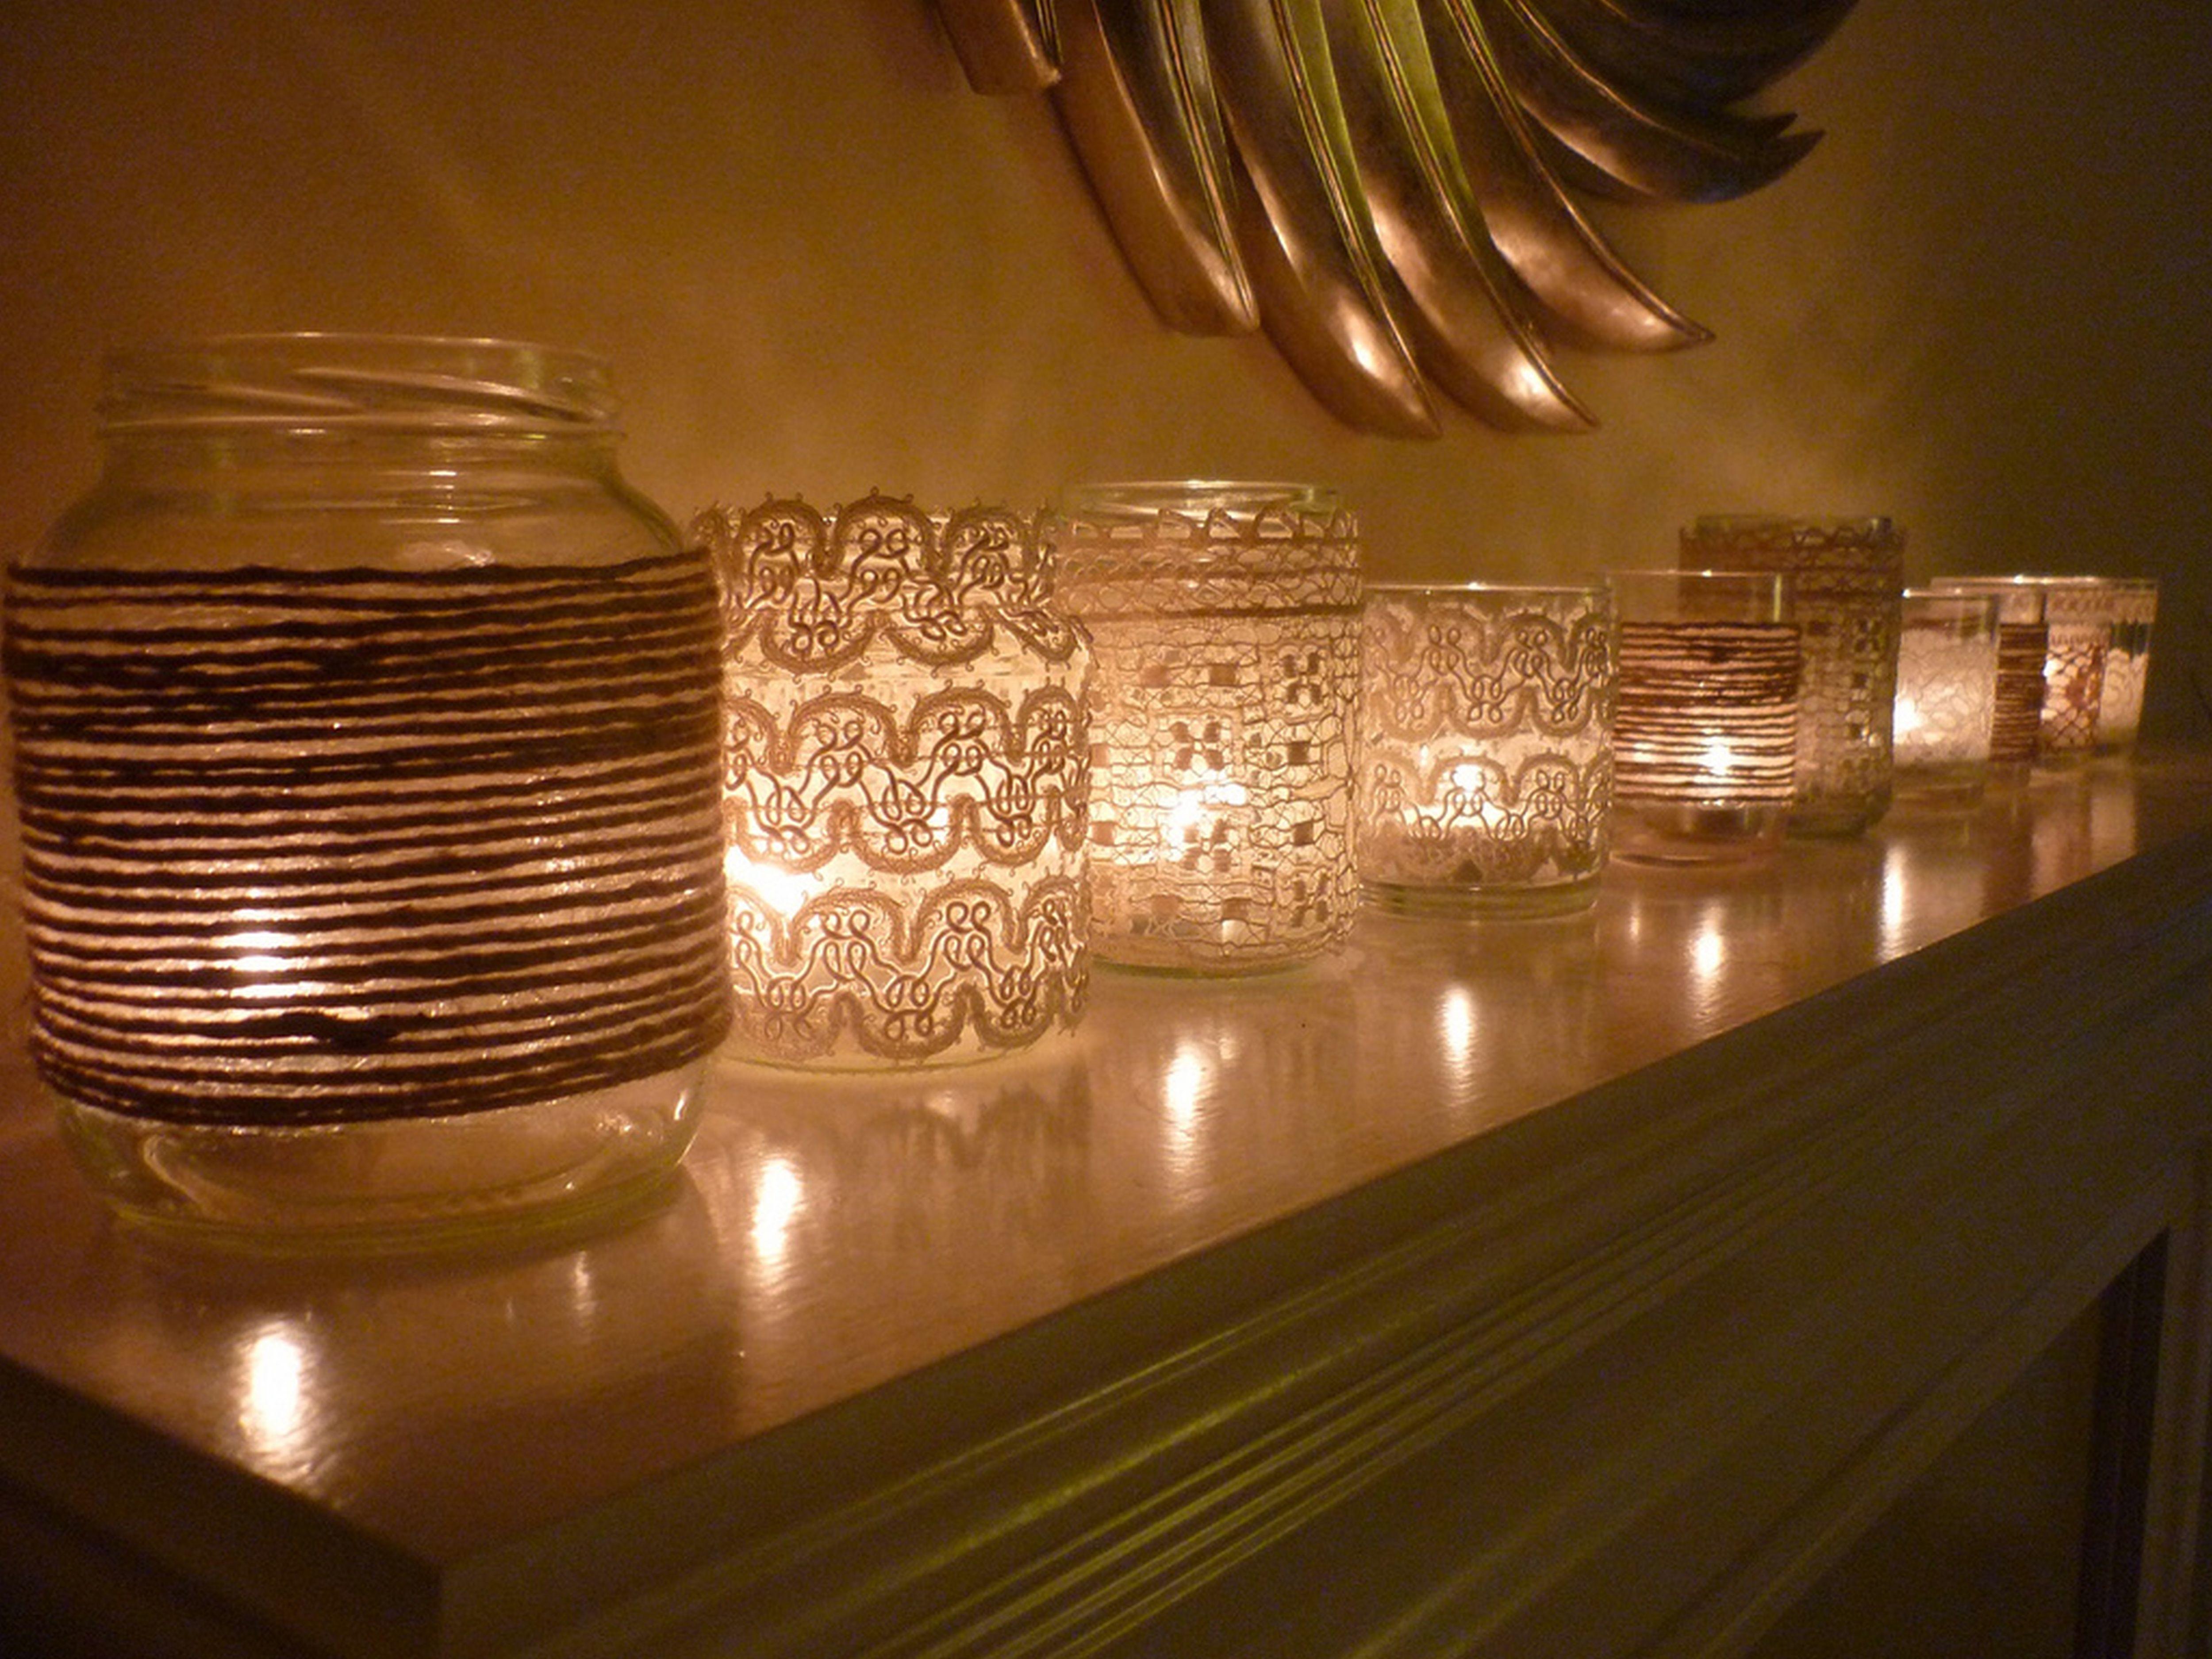 diy-home-decor-ideas-living-roomcheap-decorating-ideas-for-your-home